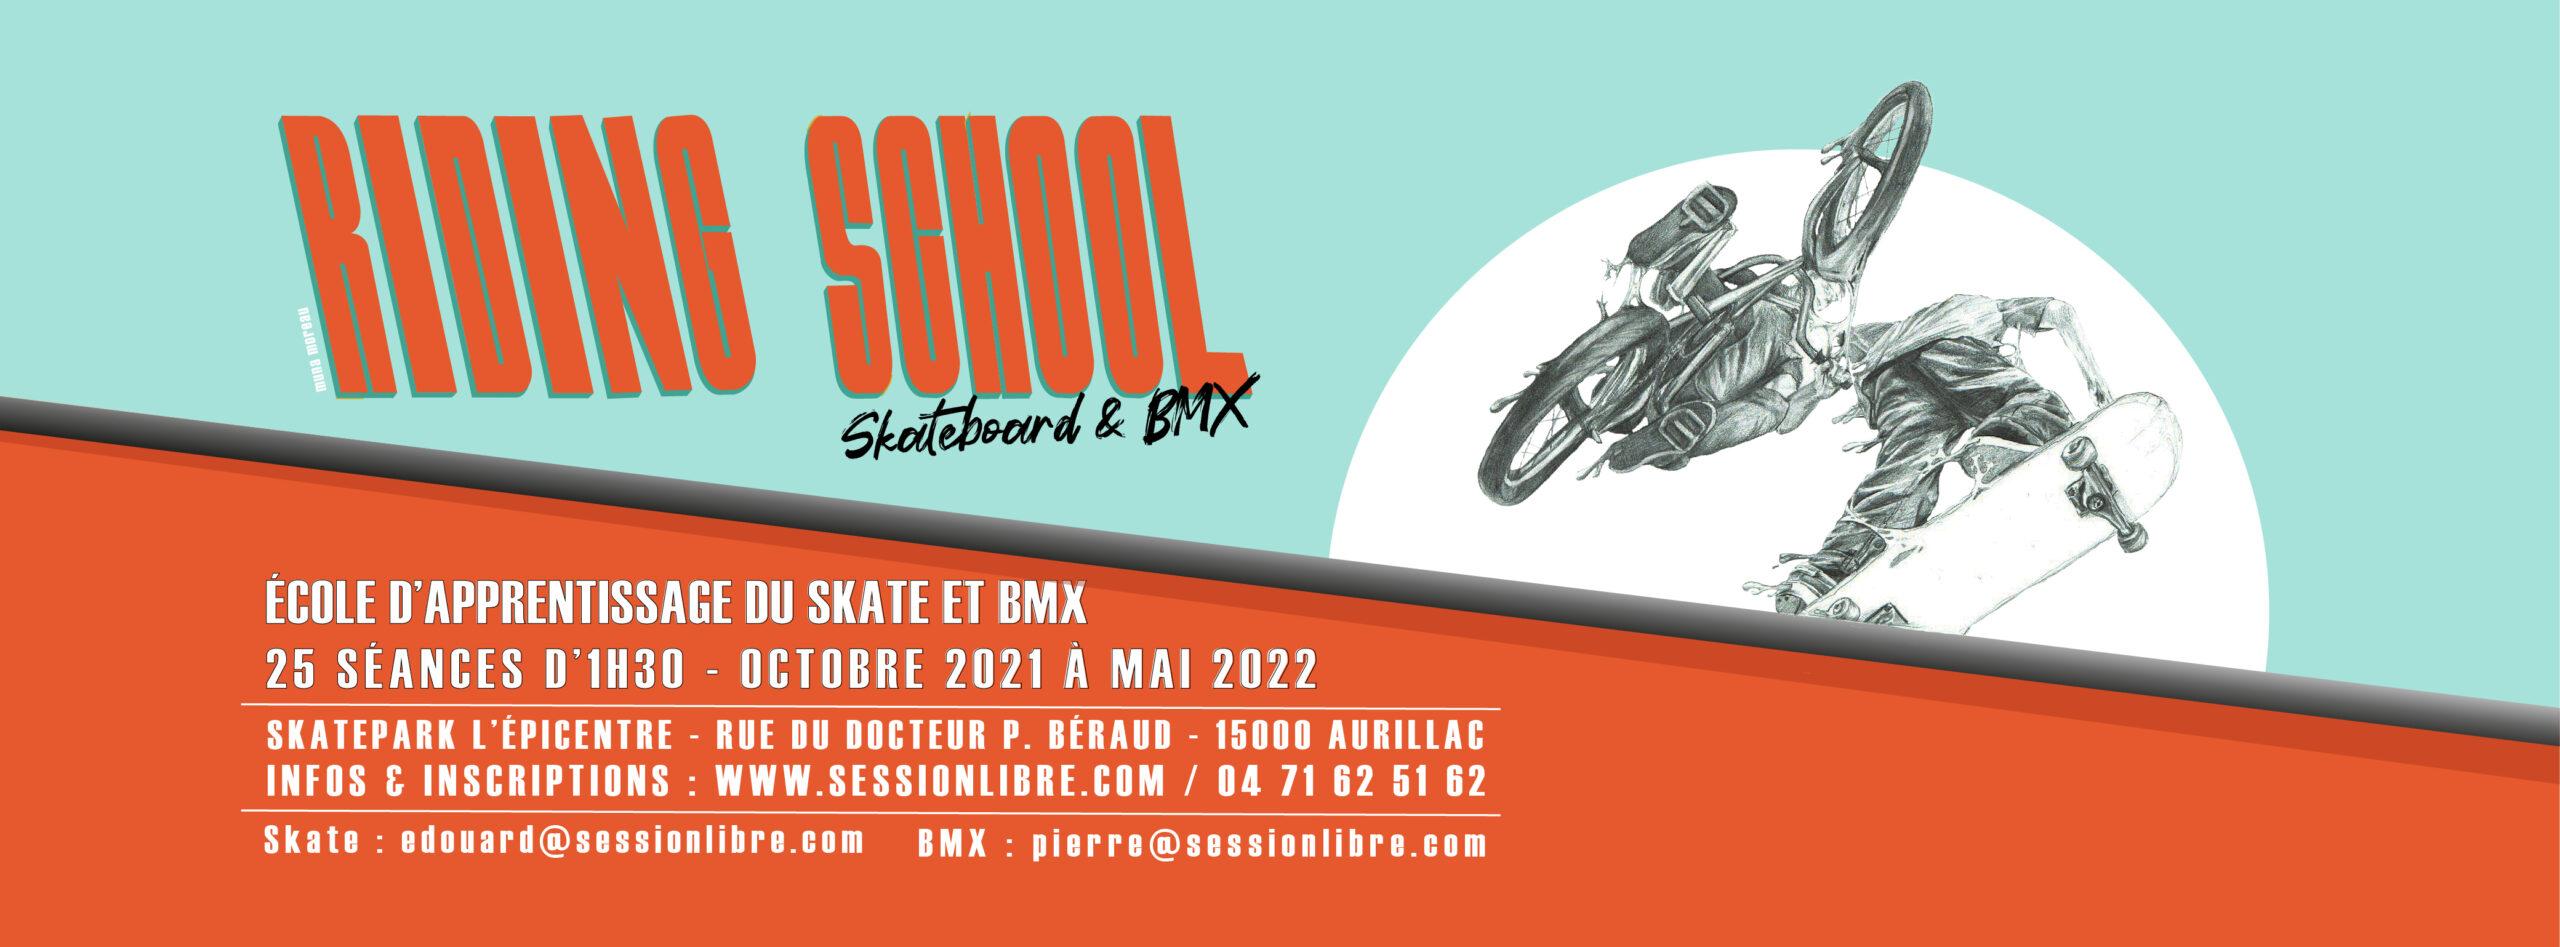 Riding School 2021 – 2022 (Skate // BMX)